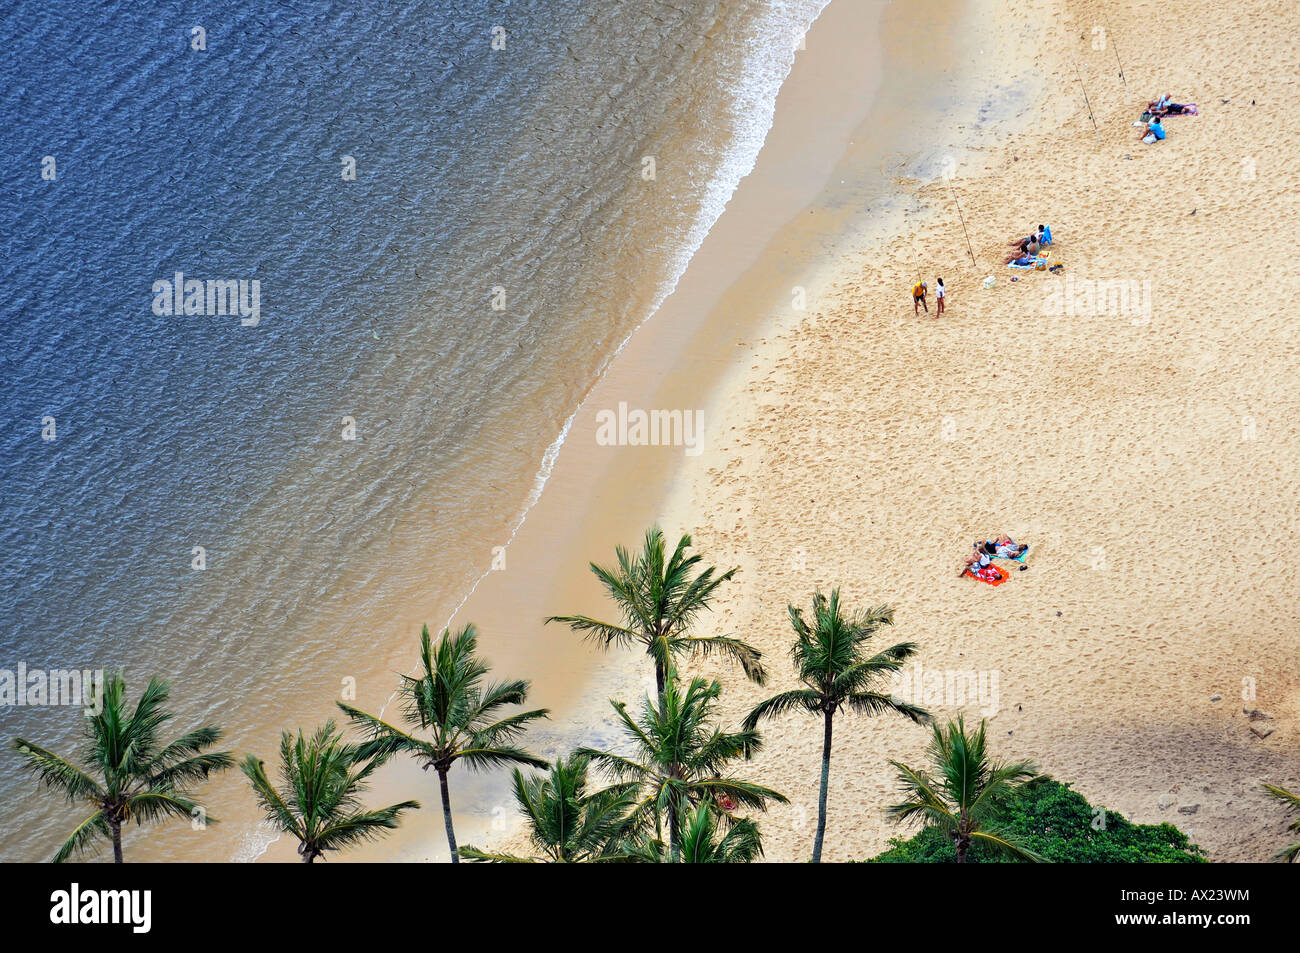 Beach with palm trees and anglers, Rio de Janeiro, Brazil - Stock Image